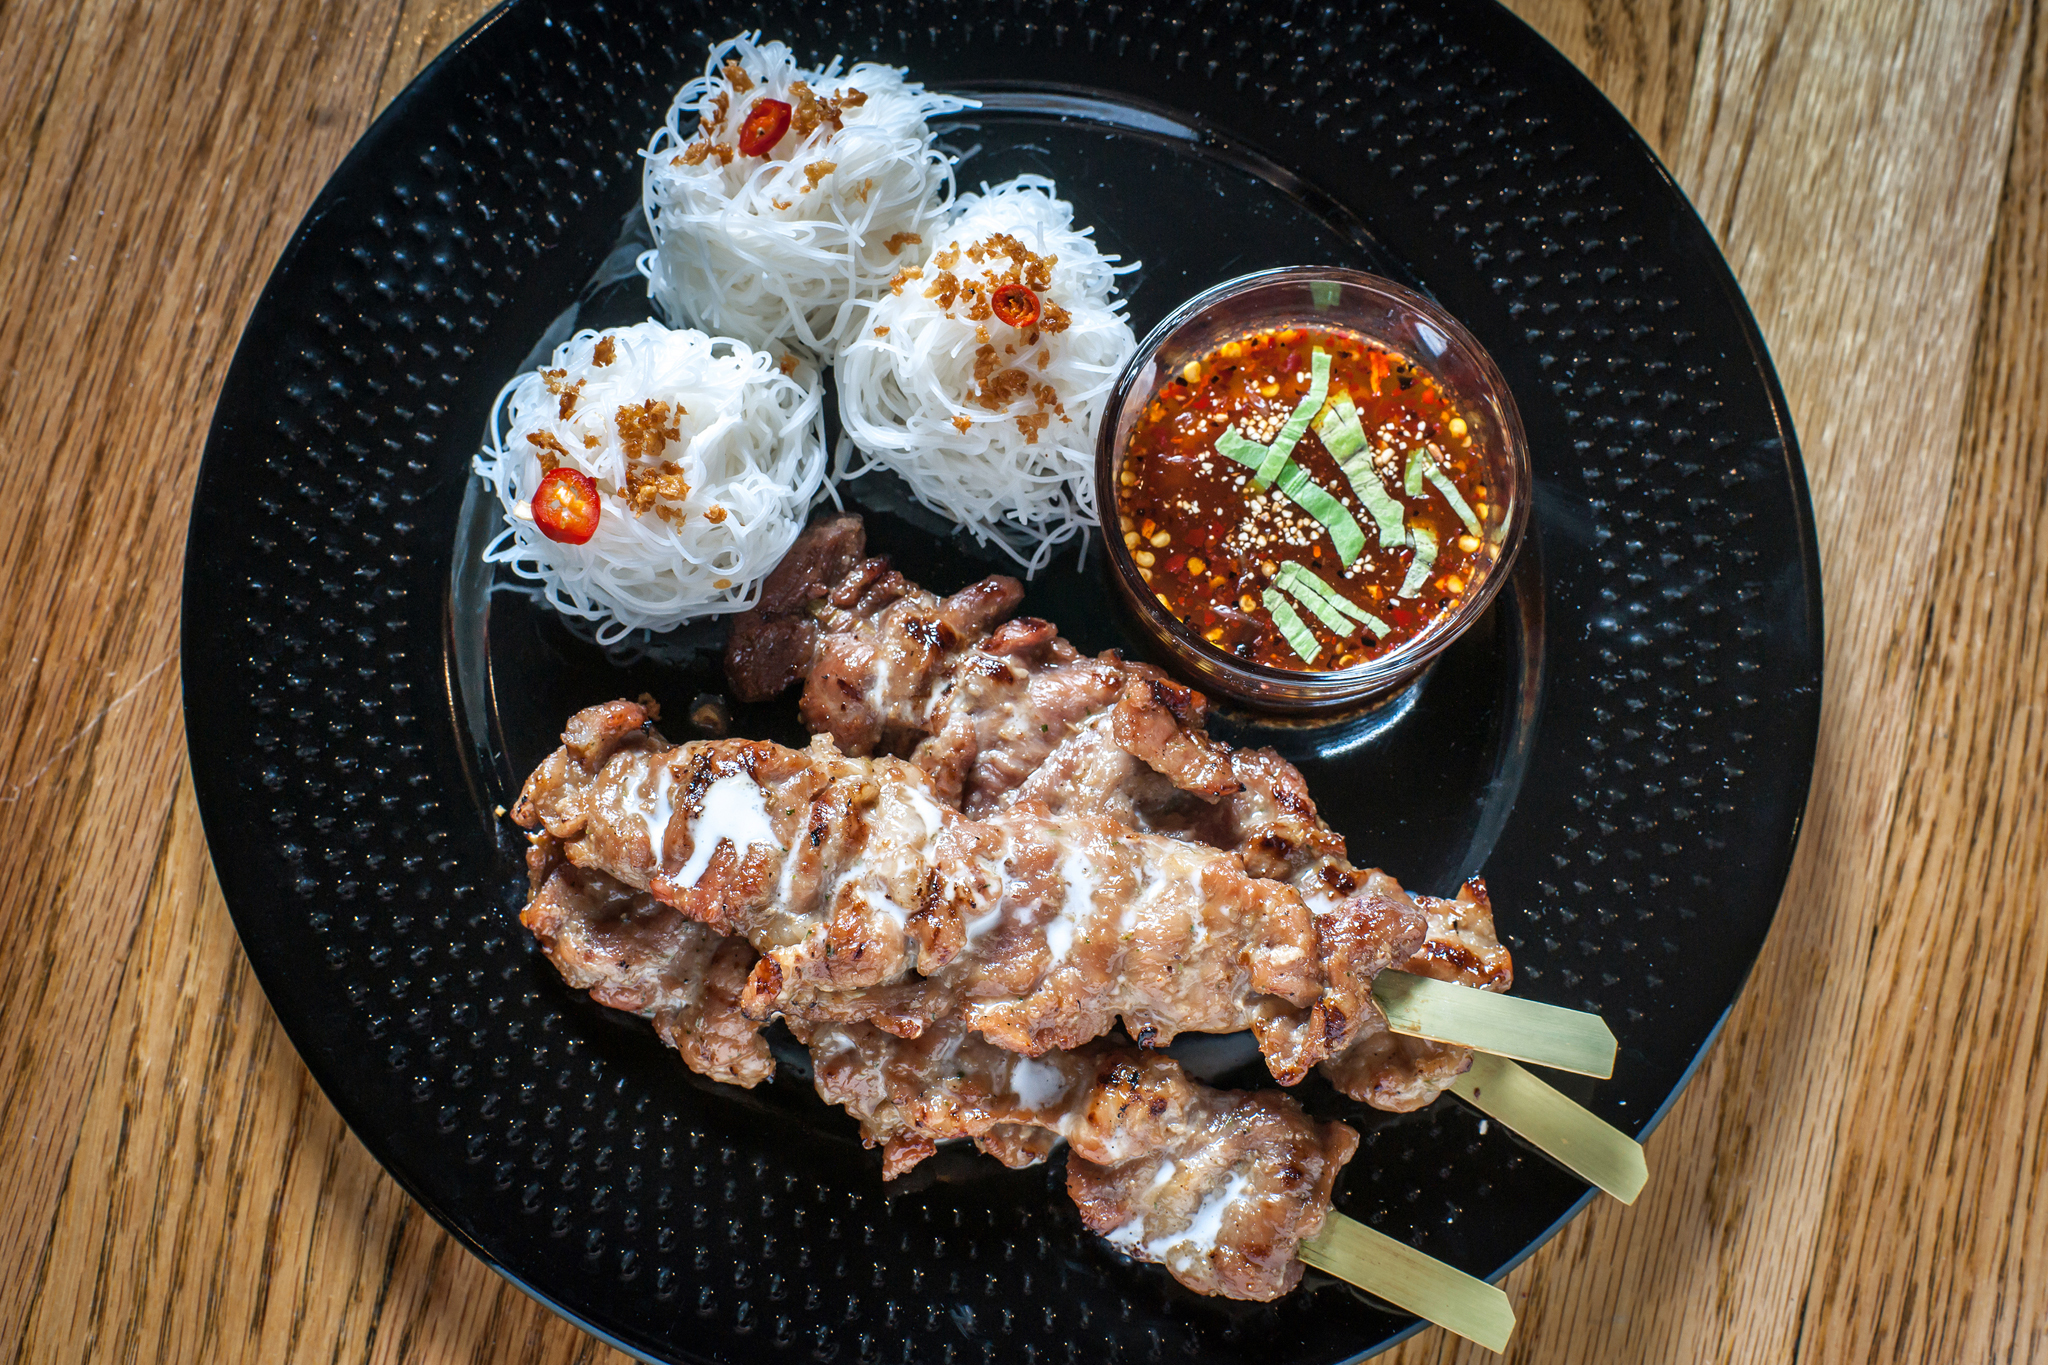 Mool Nue Ding Kati Sod (Grilled Coconut Milk Marinated Pork and Beef Skewers) at Somtum Der